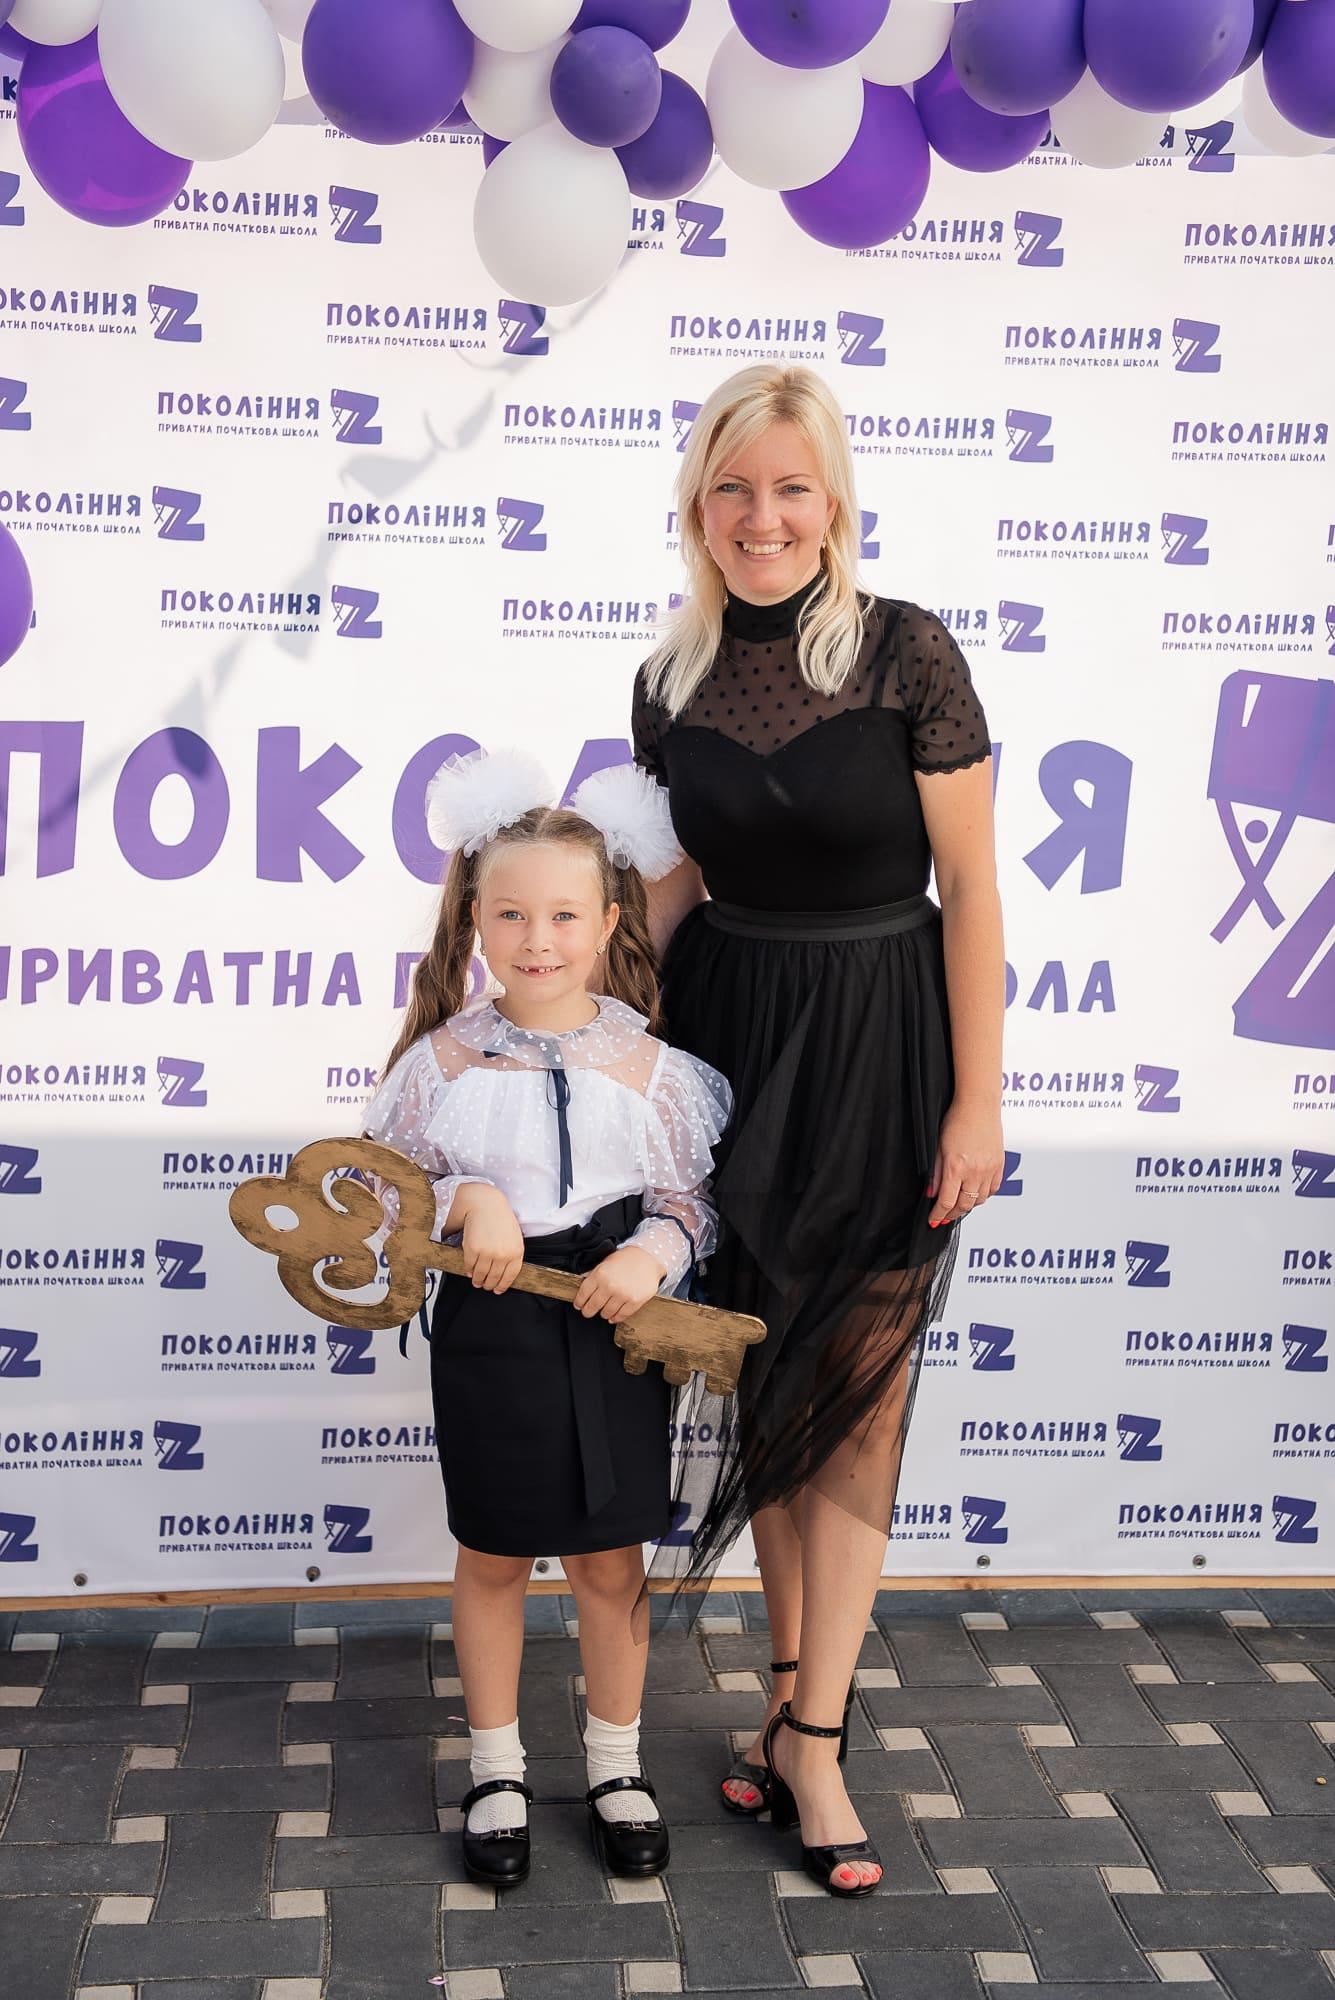 https://akademia-detstva.od.ua/app/uploads/2021/09/321.jpg